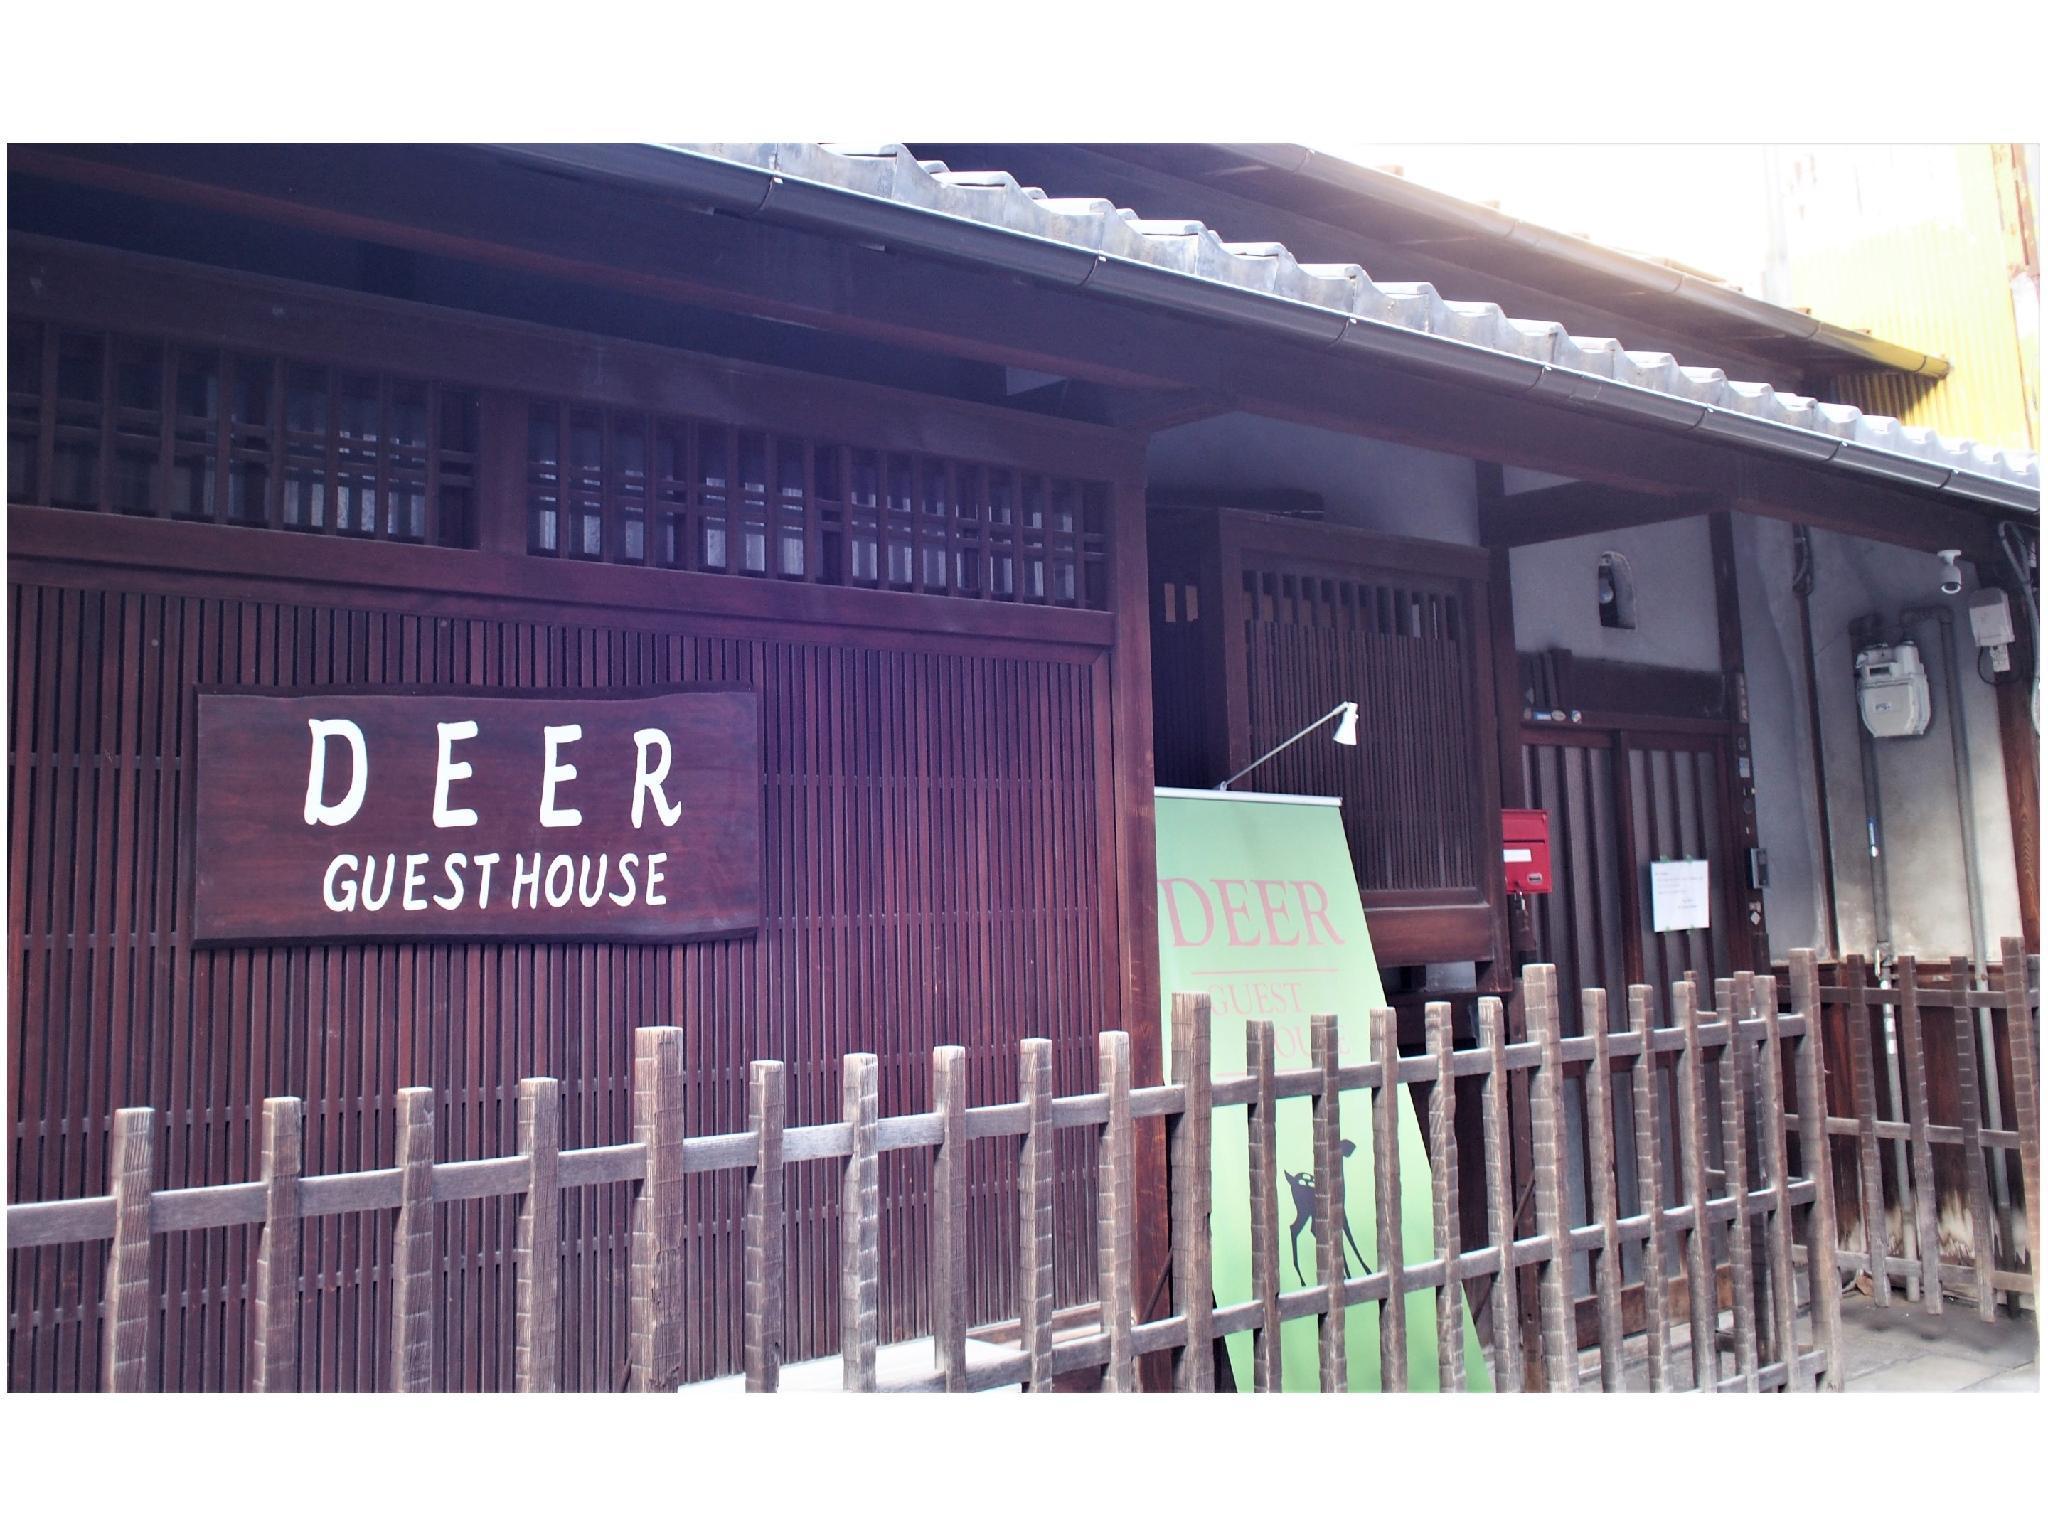 Deer Guesthouse